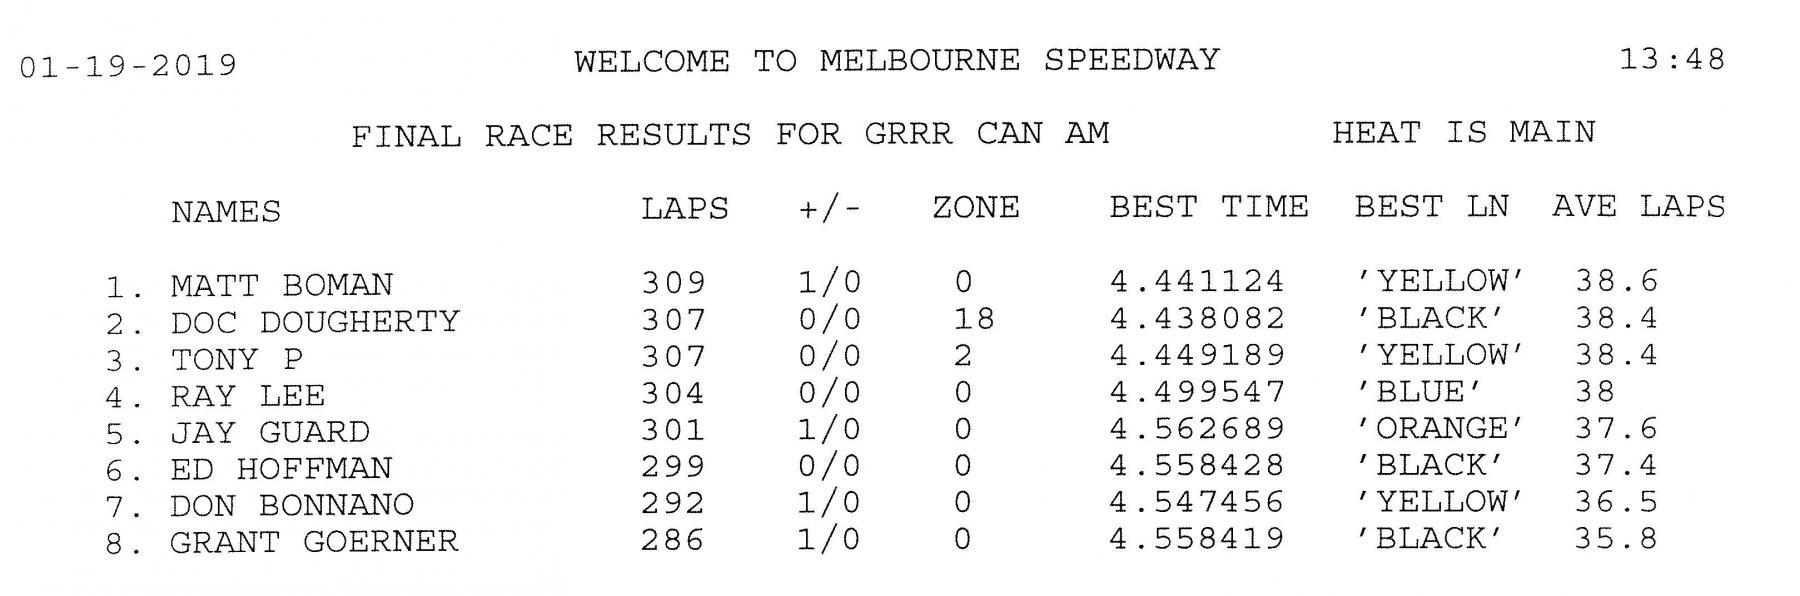 1.19.19 GRRR Can-Am B Main Final Result.jpg